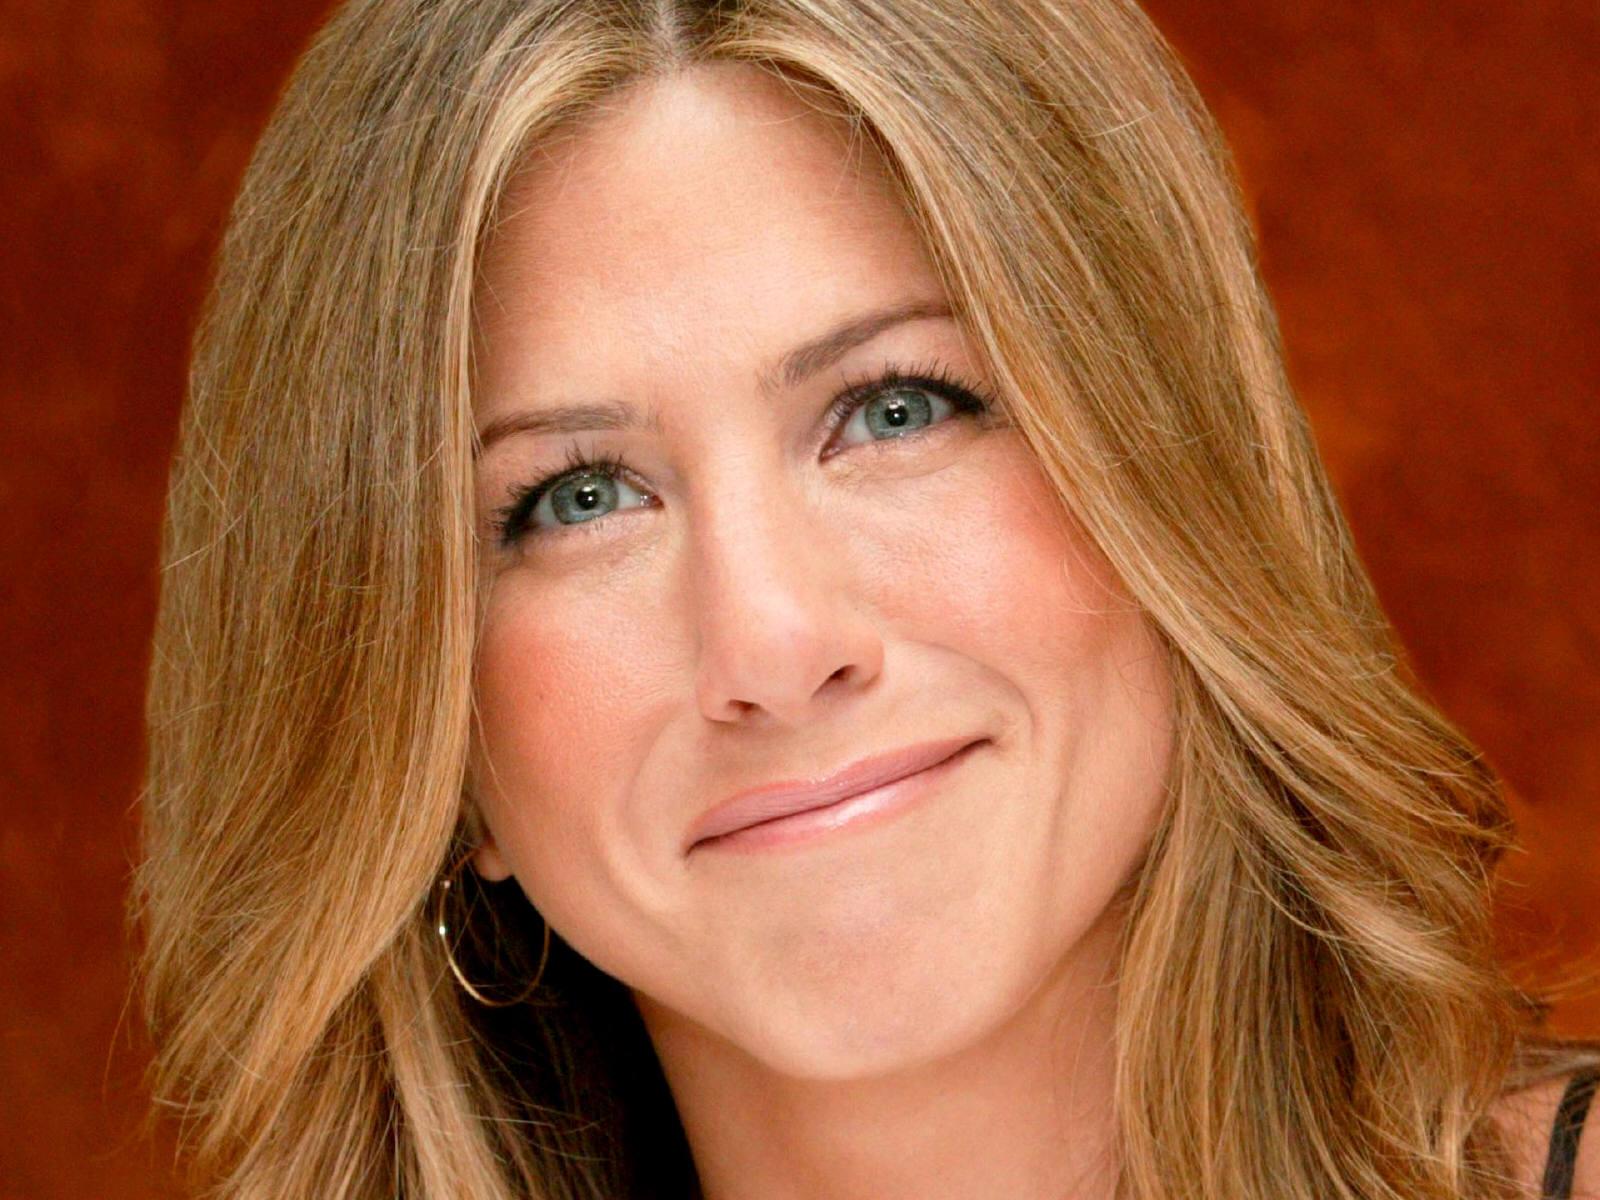 http://2.bp.blogspot.com/-eMlil6pihLE/ThL3xfHBdnI/AAAAAAAAB08/YENclVWgGo0/s1600/Jennifer_Aniston_wallpaper_12.jpg